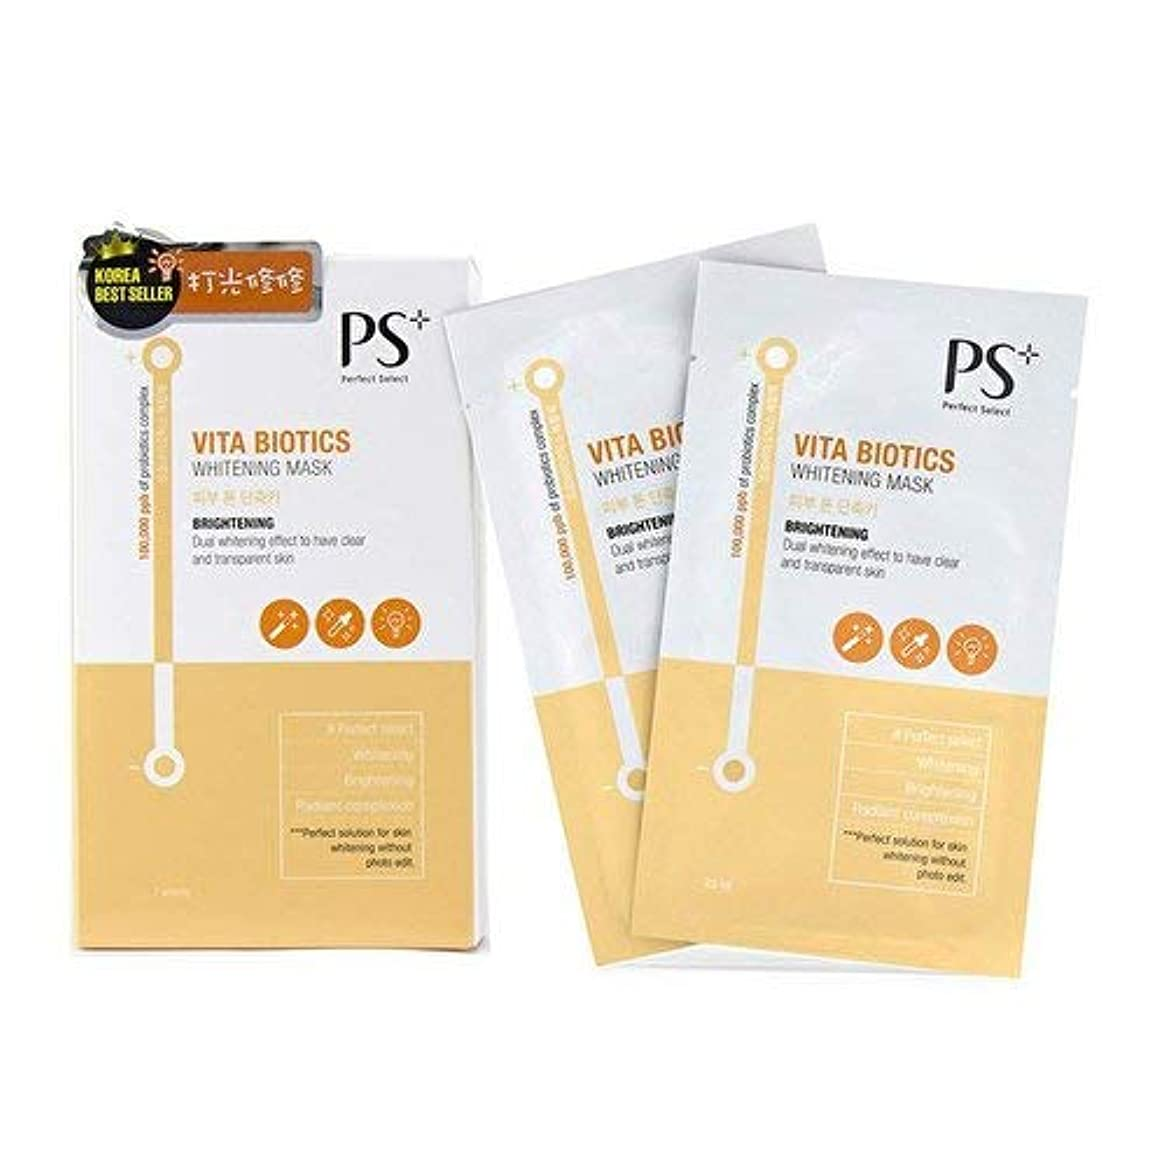 PS Perfect Select Vita Biotics Whitening Mask - Brightening 7pcs並行輸入品